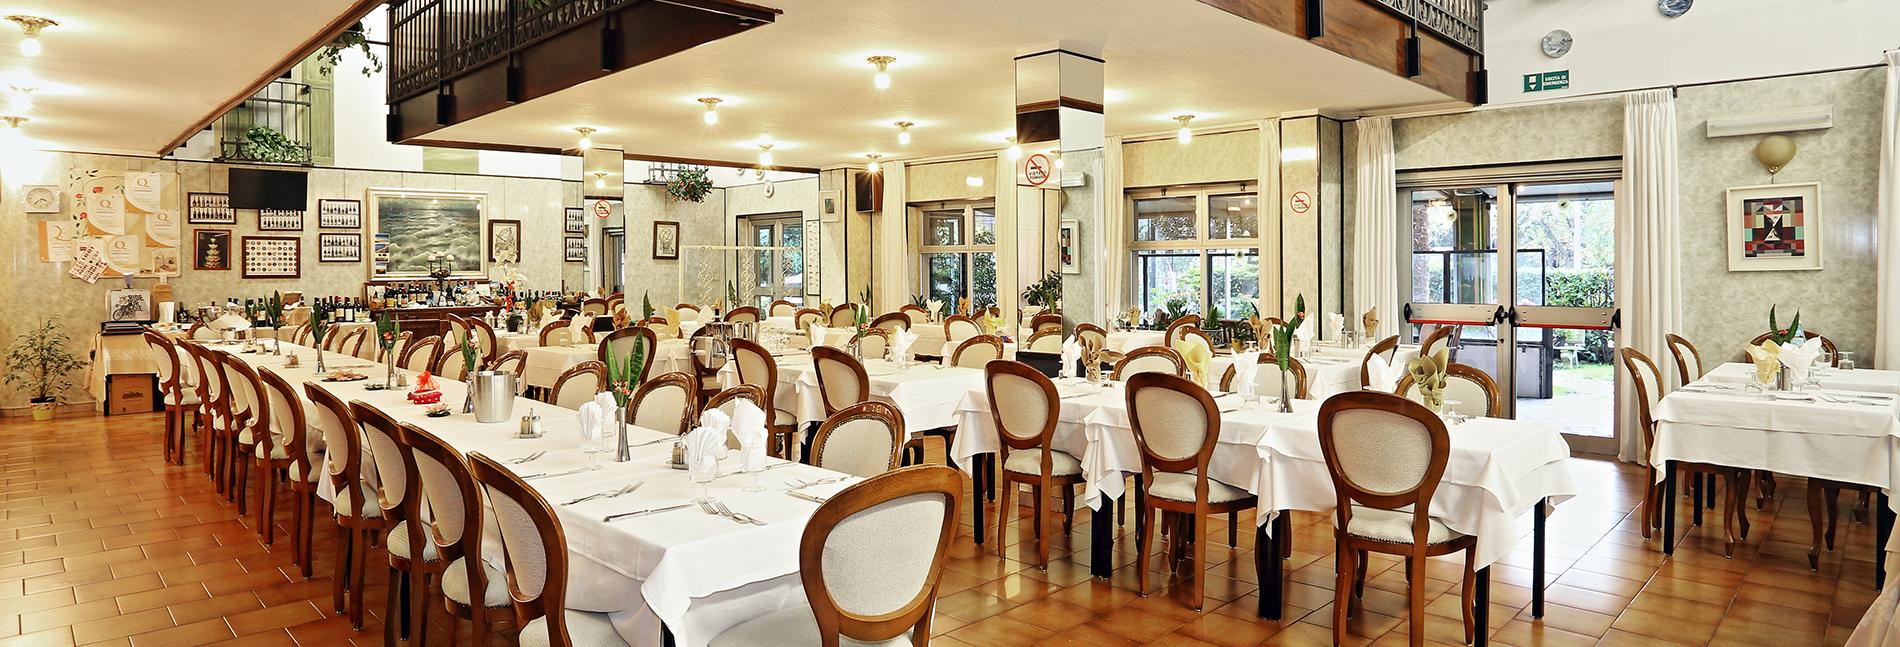 ristorante-hotel-sogno-novara